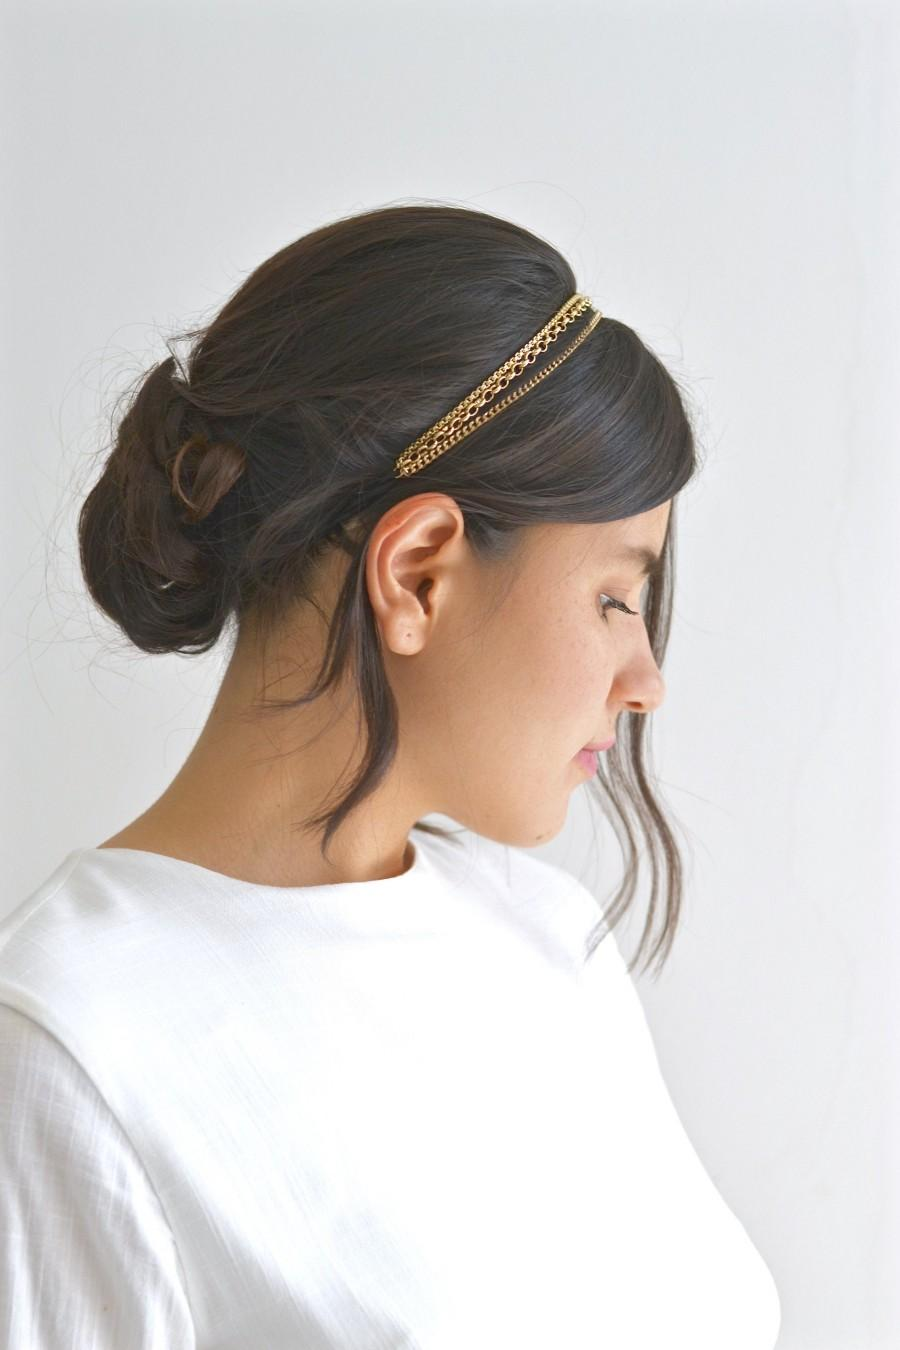 Mariage - Headband headband triple bride 3 fine chains gold or Hair head hairstyle romantic wedding bohemian delicate fine headband